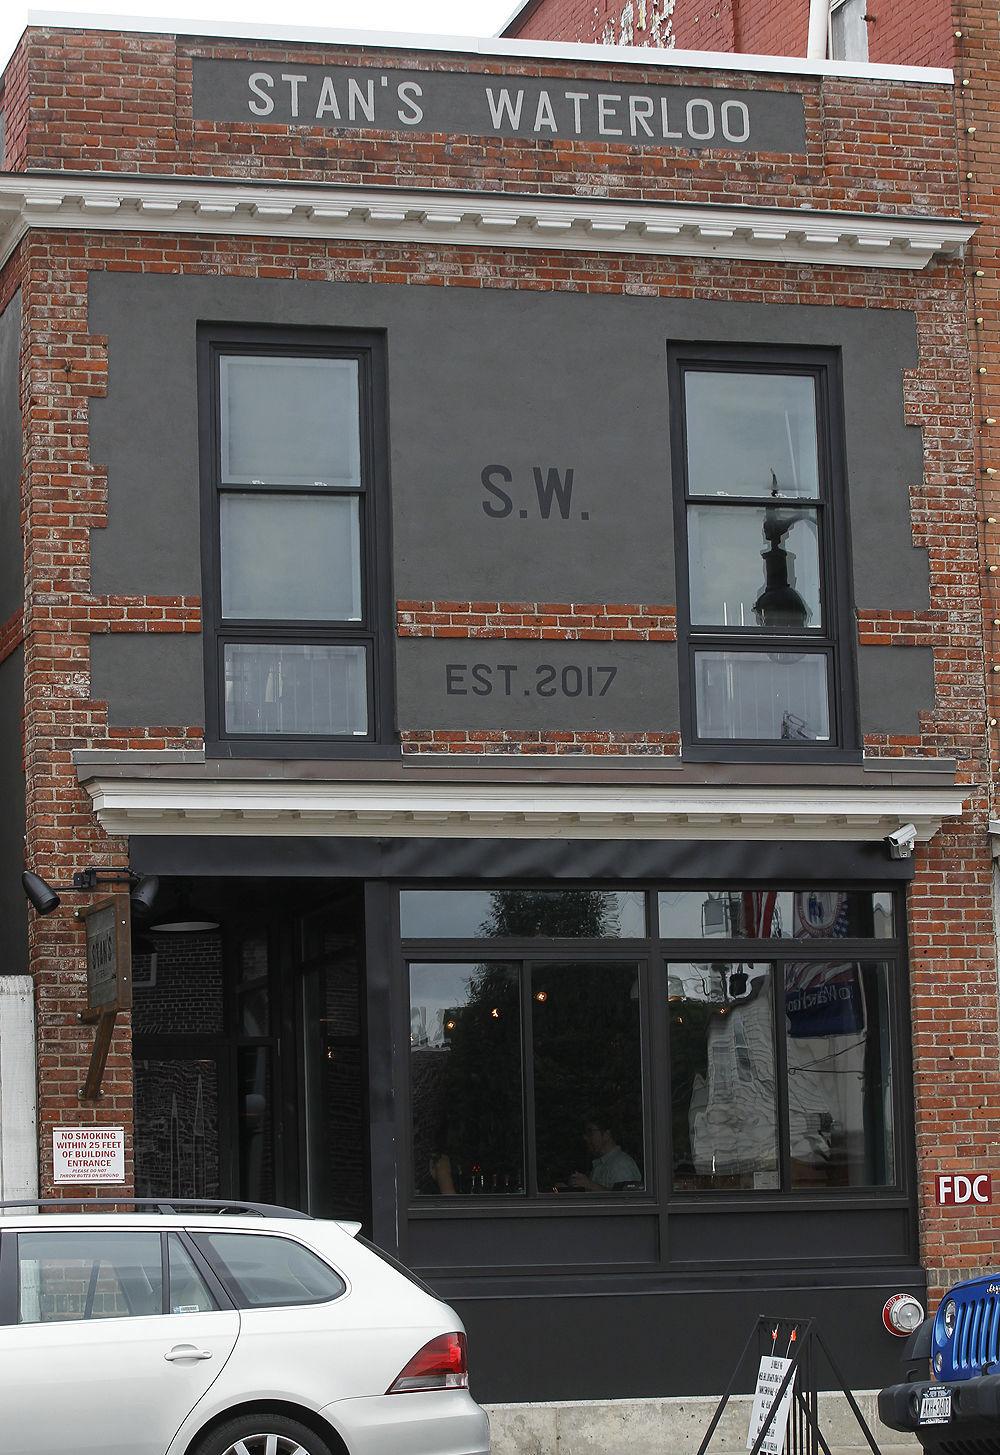 Stan's open in Waterloo